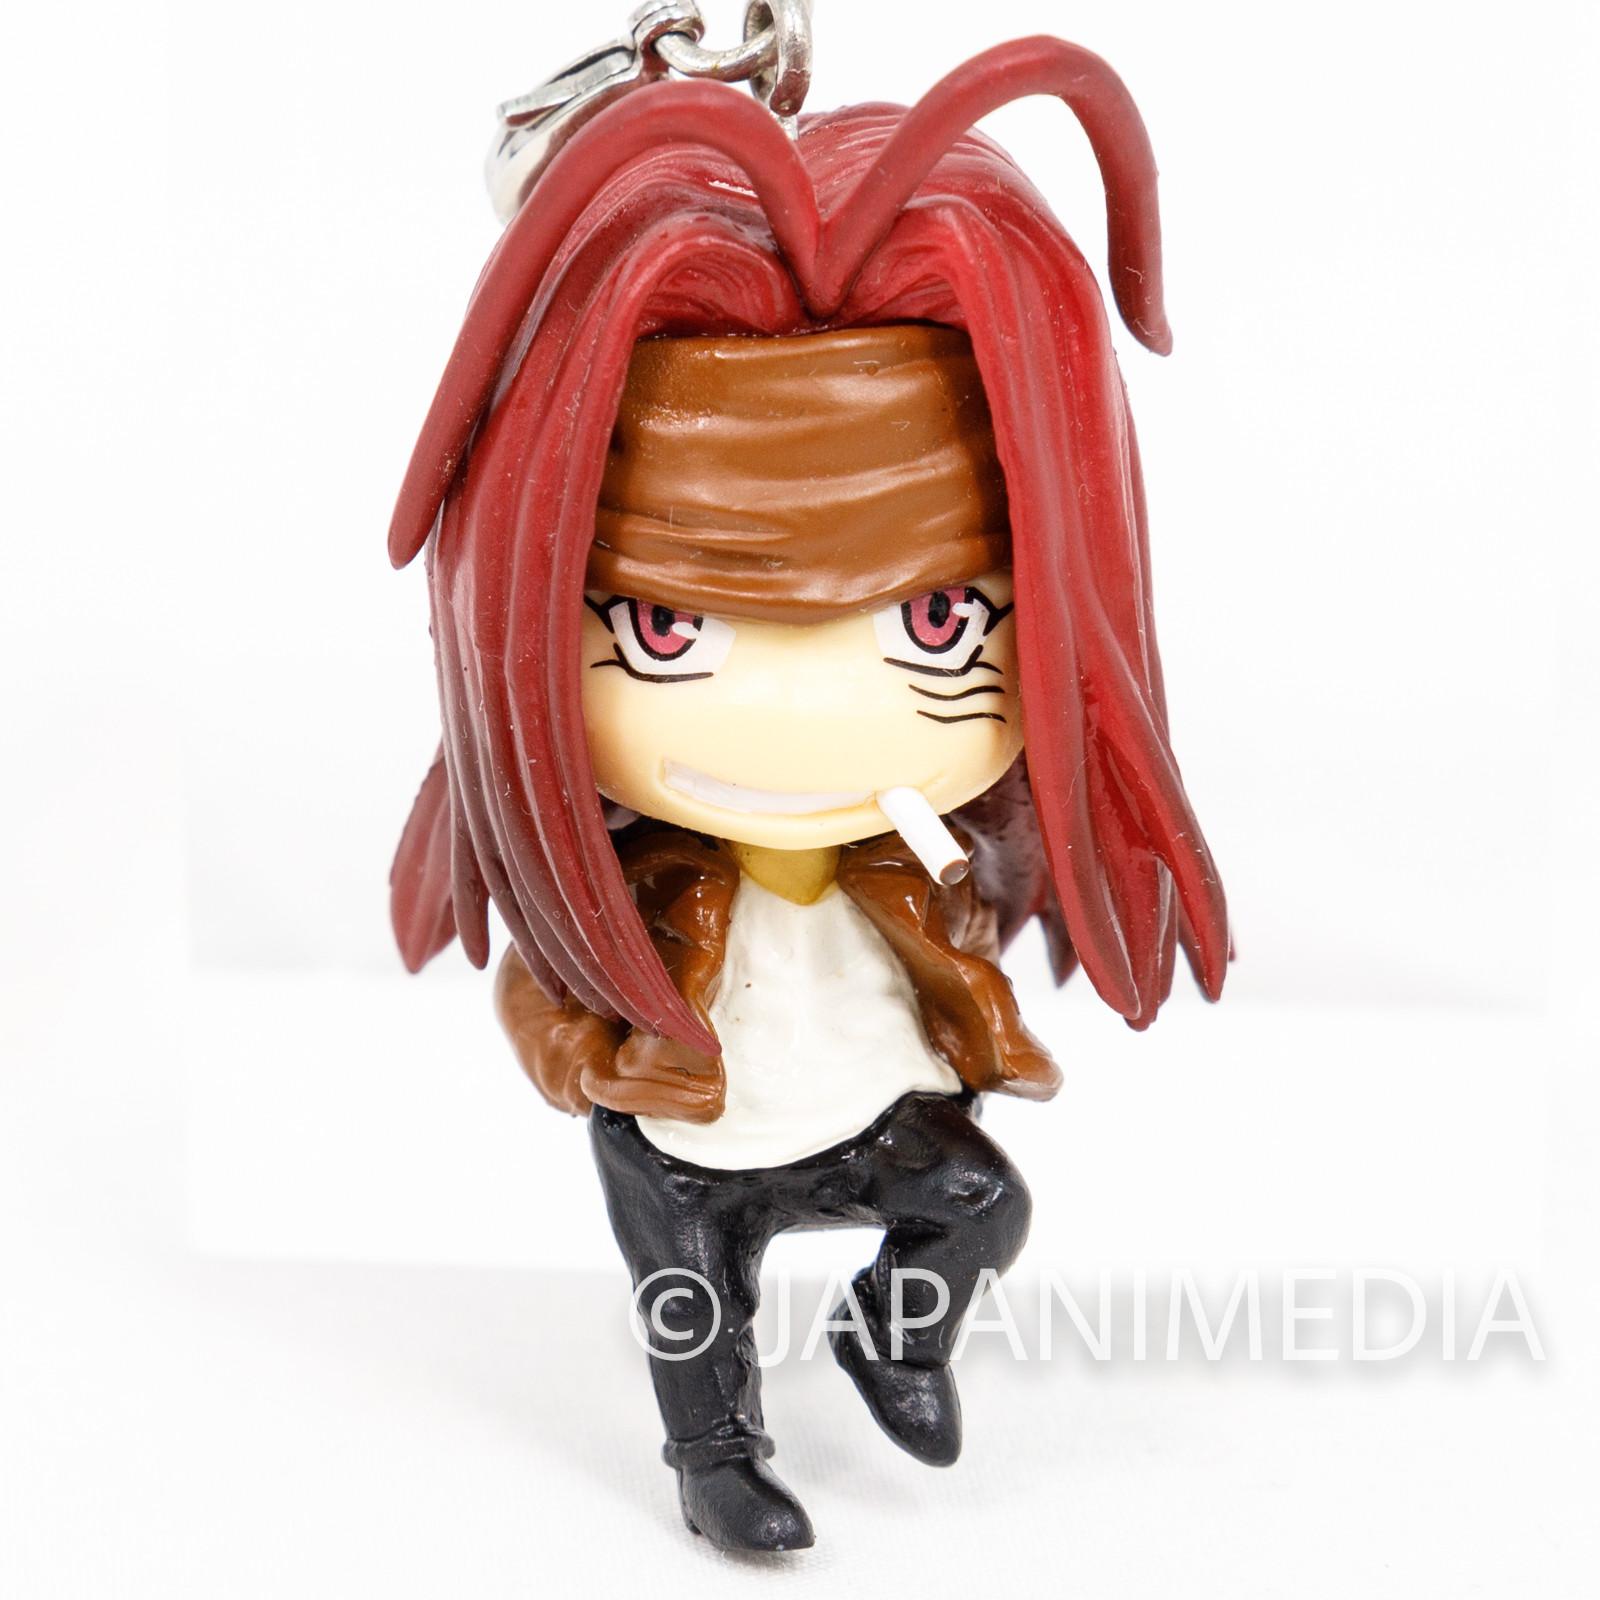 SAIYUKI Sha Gojyo KaraCole Mascot Figure Movic Kazuya Minekura JAPAN